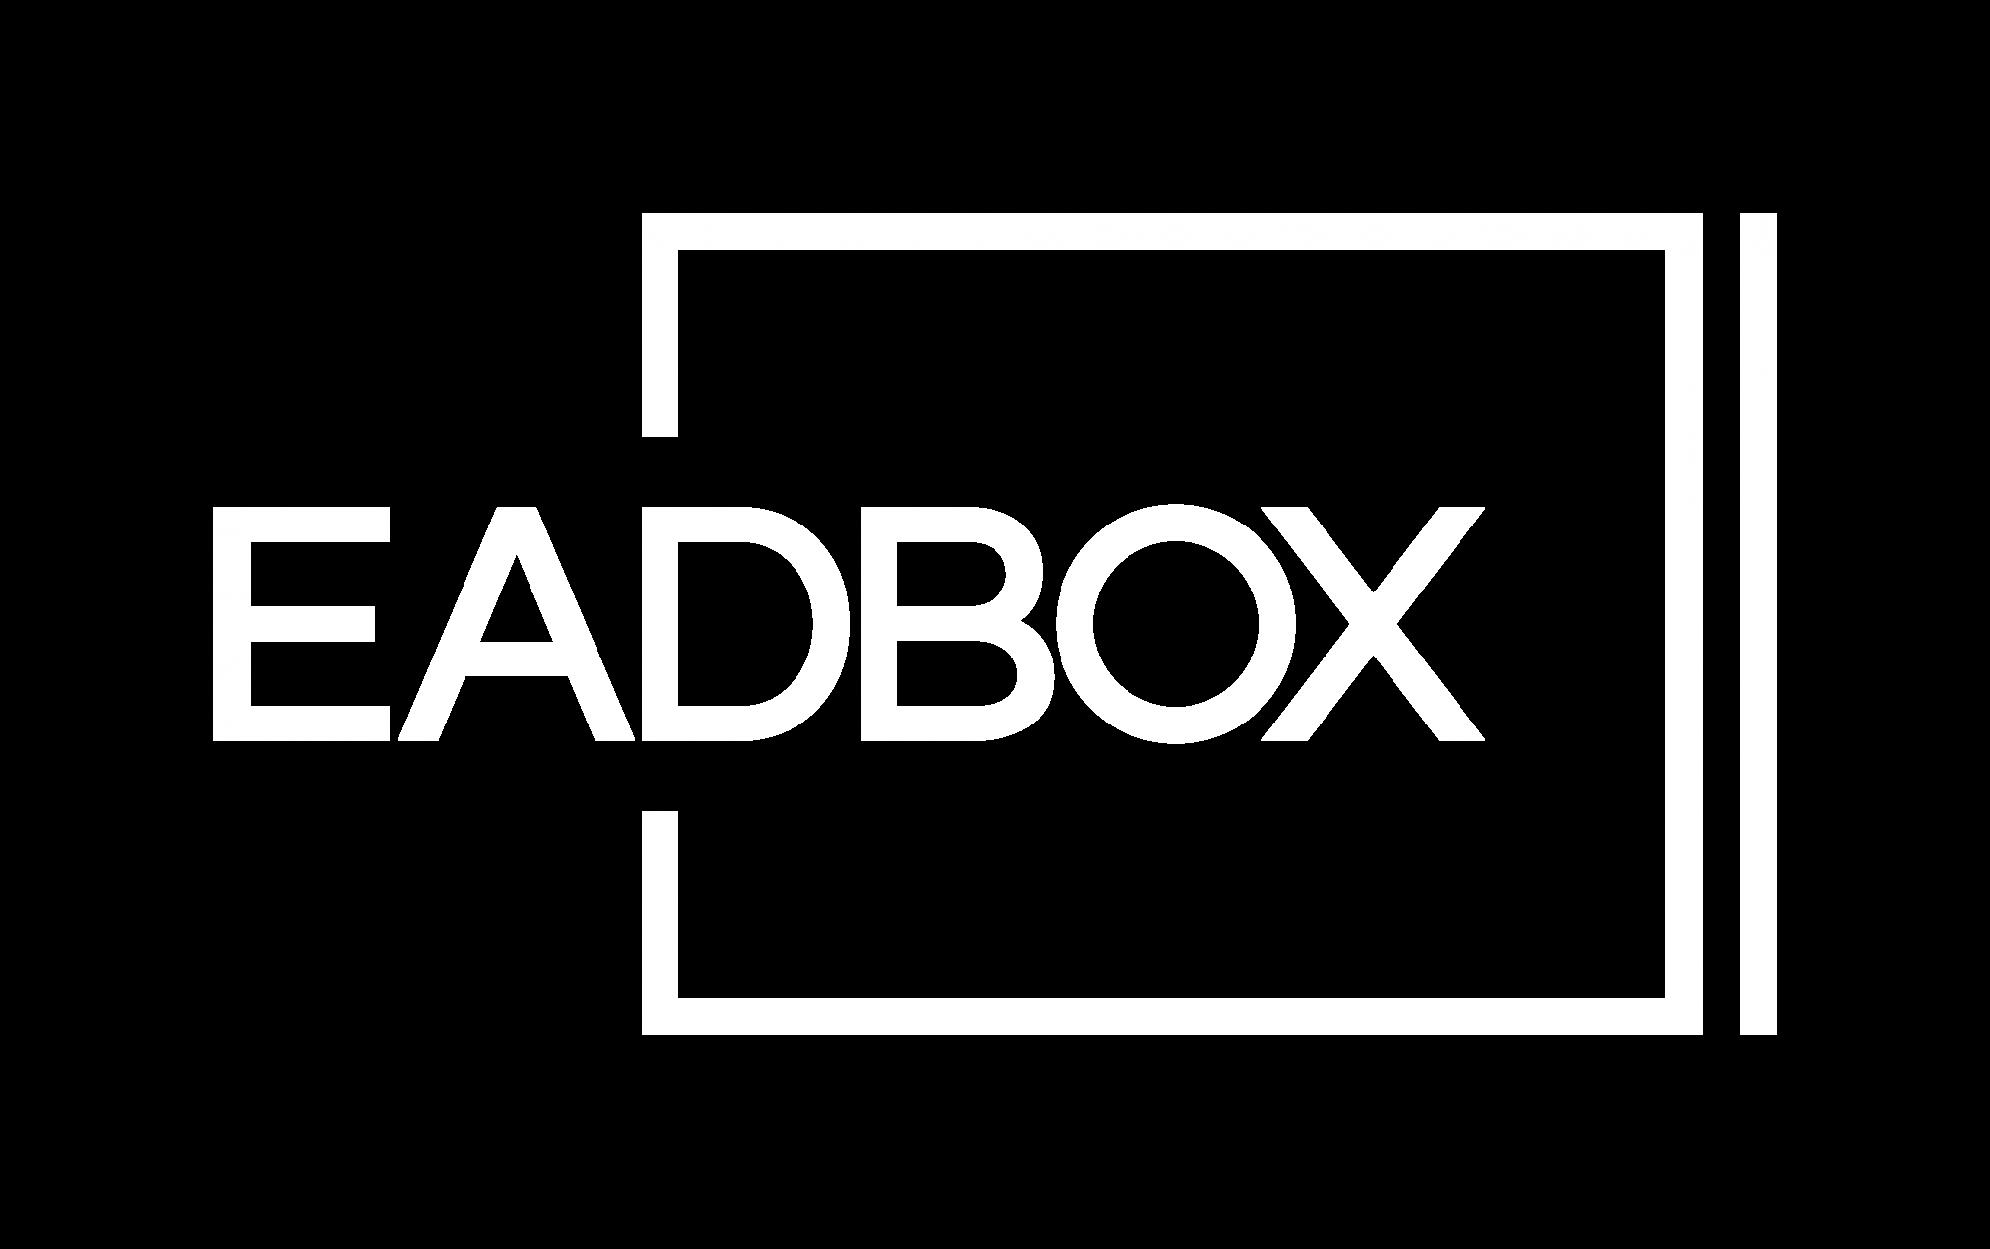 logo branca eadbox